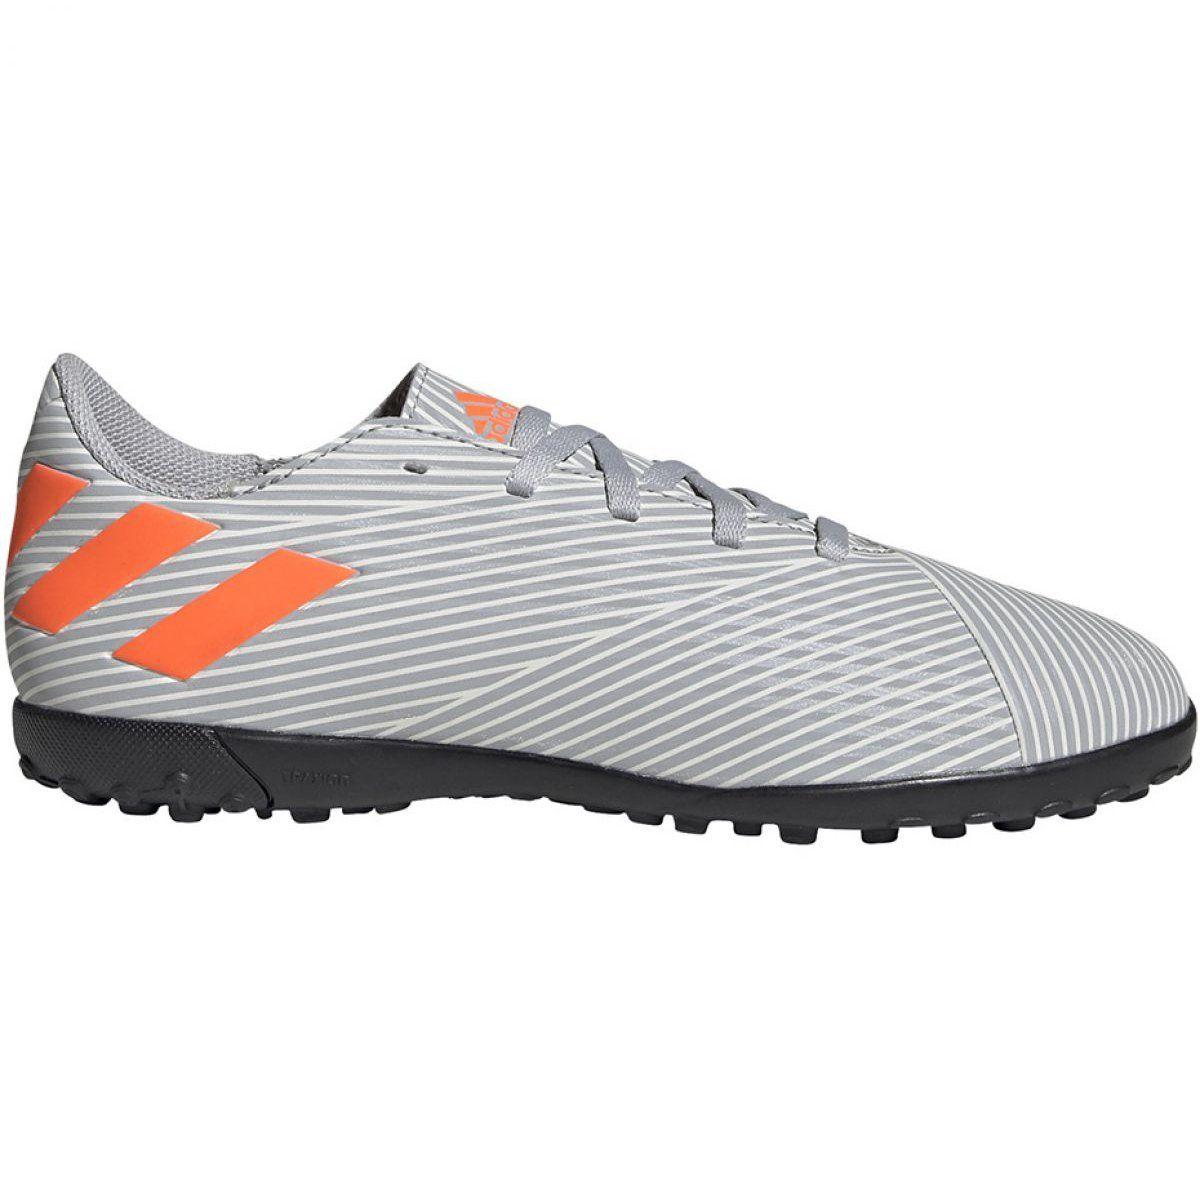 Buty Pilkarskie Adidas Nemeziz 19 4 Tf Jr Ef8306 Wielokolorowe Szare Football Shoes Shoes Adidas Football